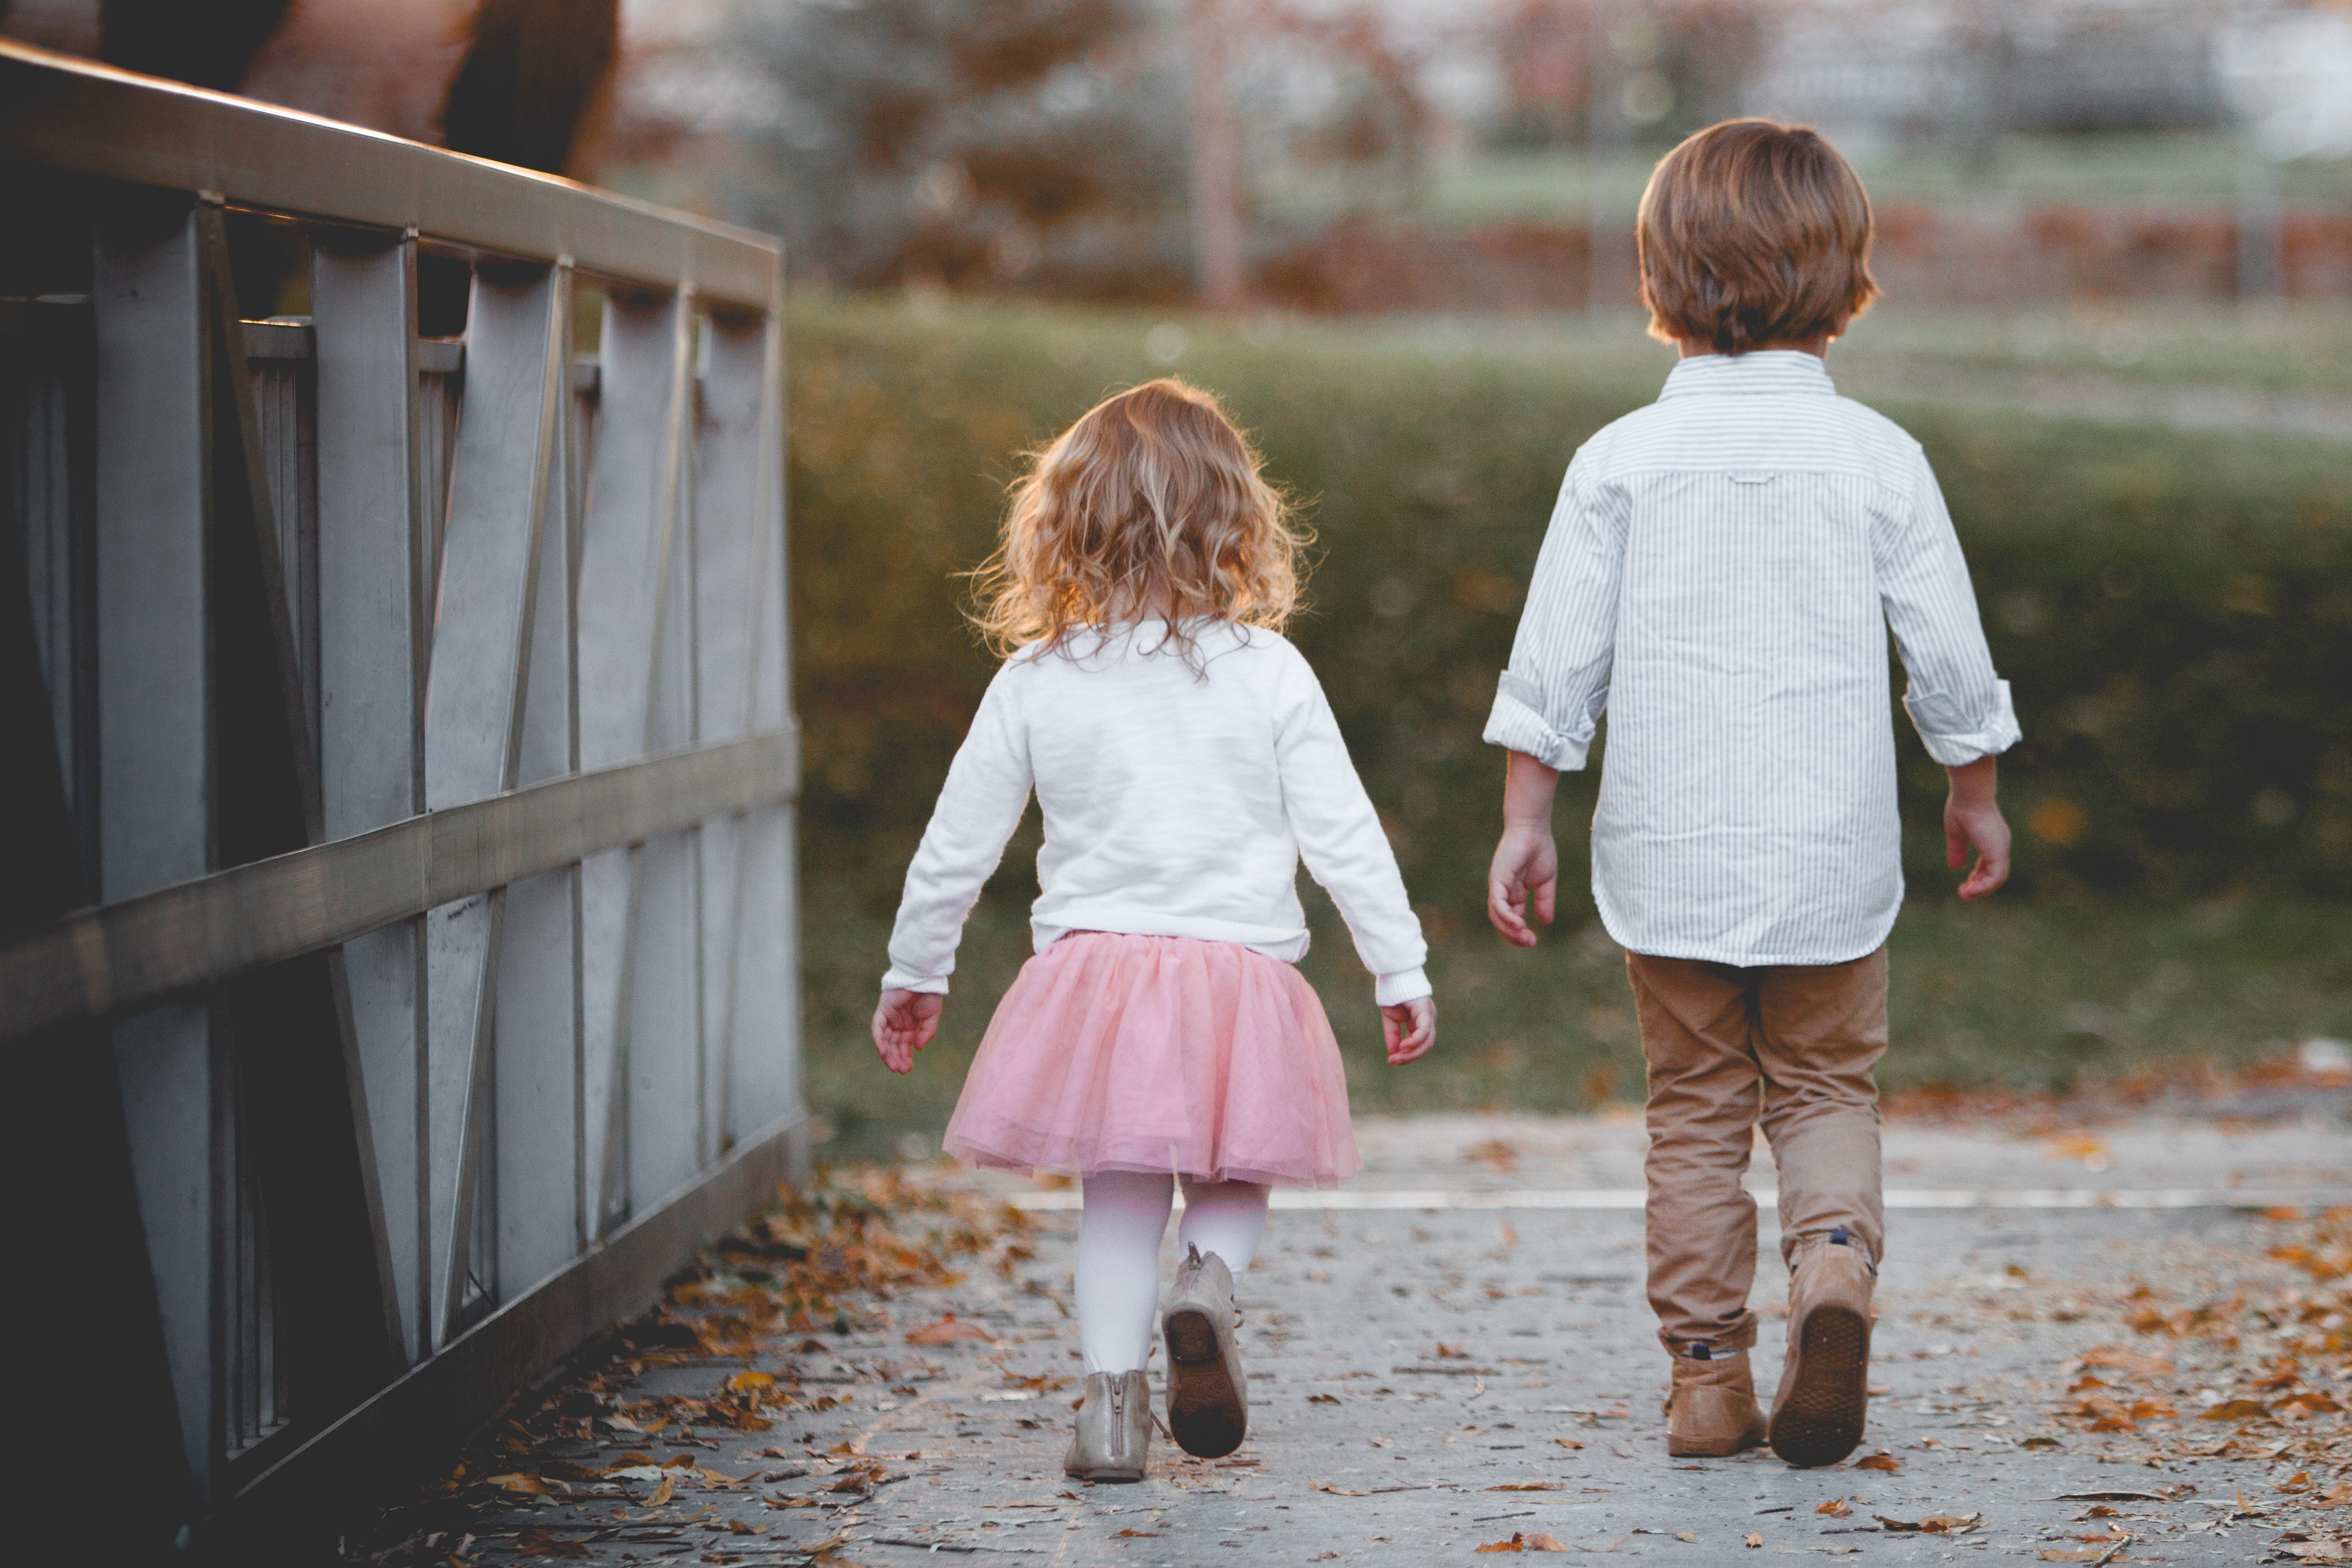 Children walking on a bridge together